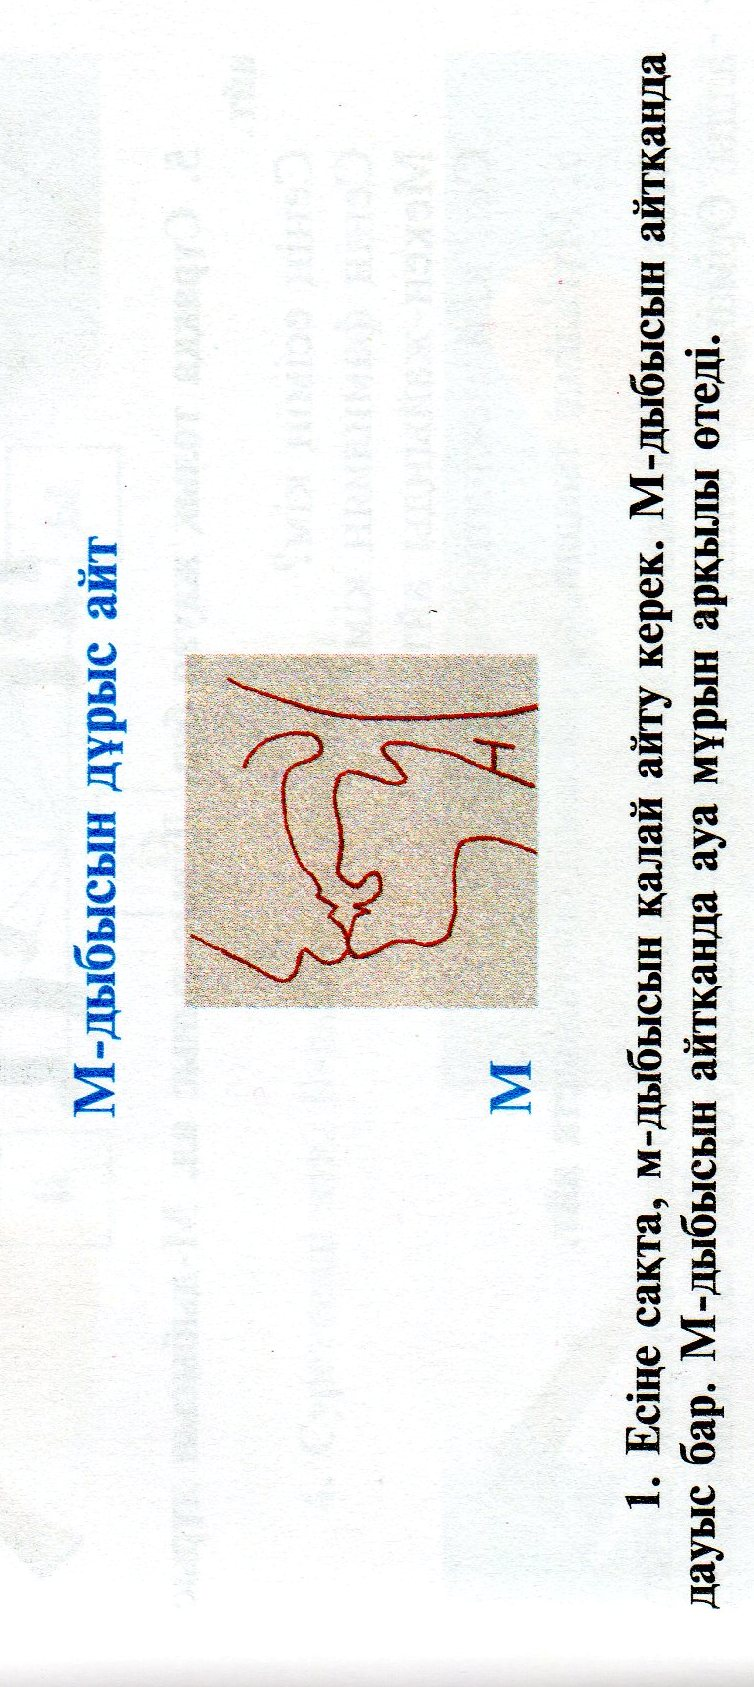 C:\Documents and Settings\Пользователь\Мои документы\Мои рисунки\img114.jpg